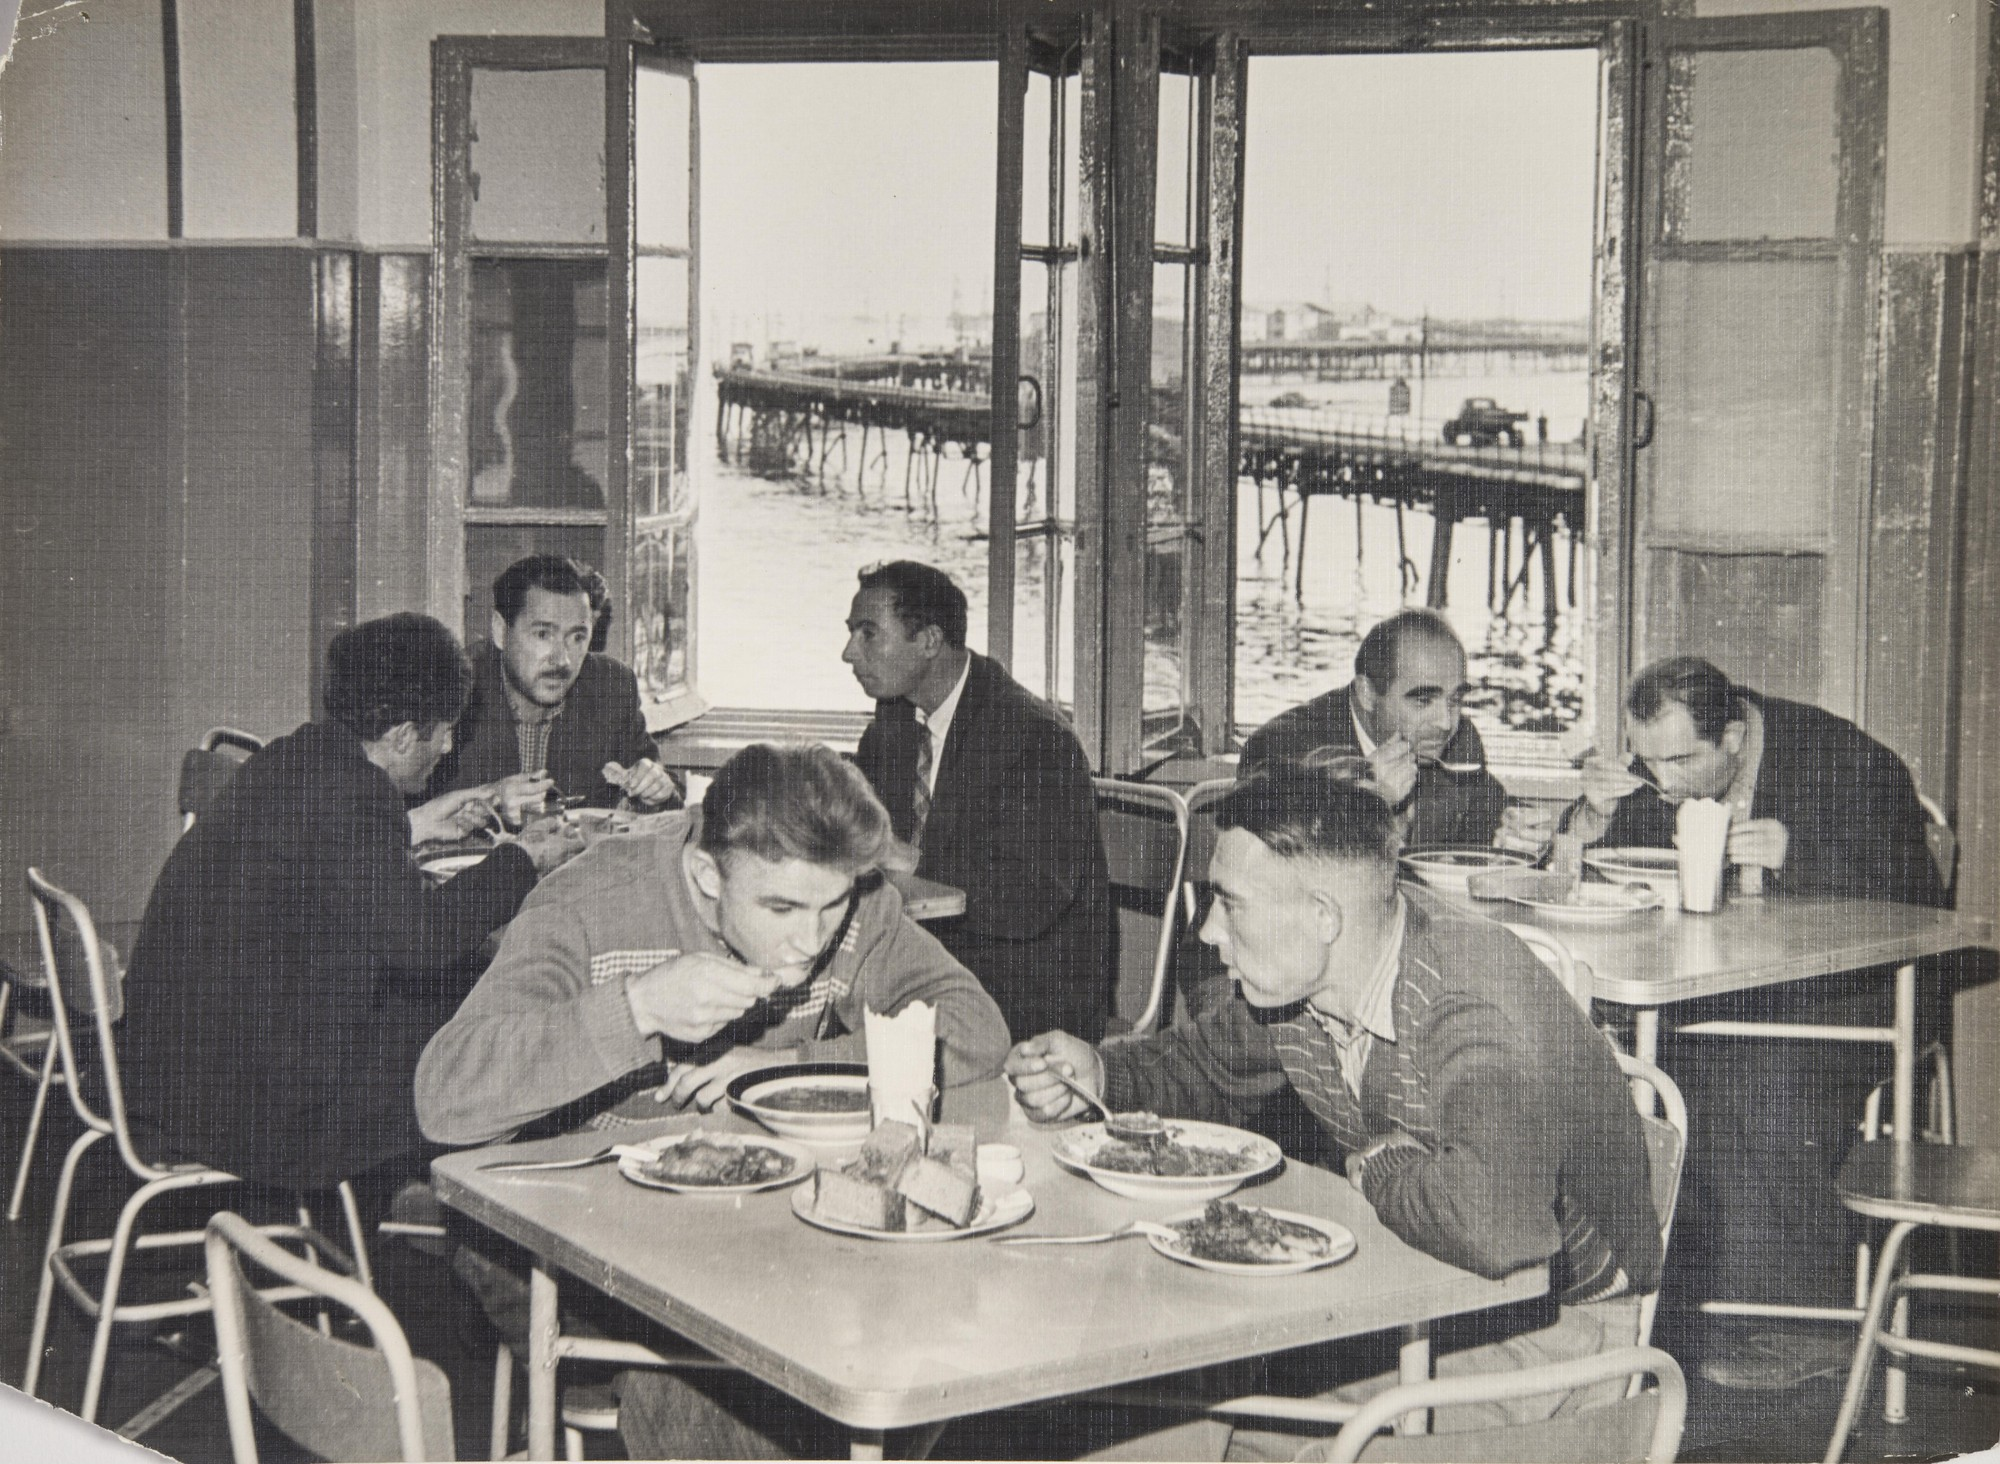 1960-е. Утро. Смена рабочих за завтраком